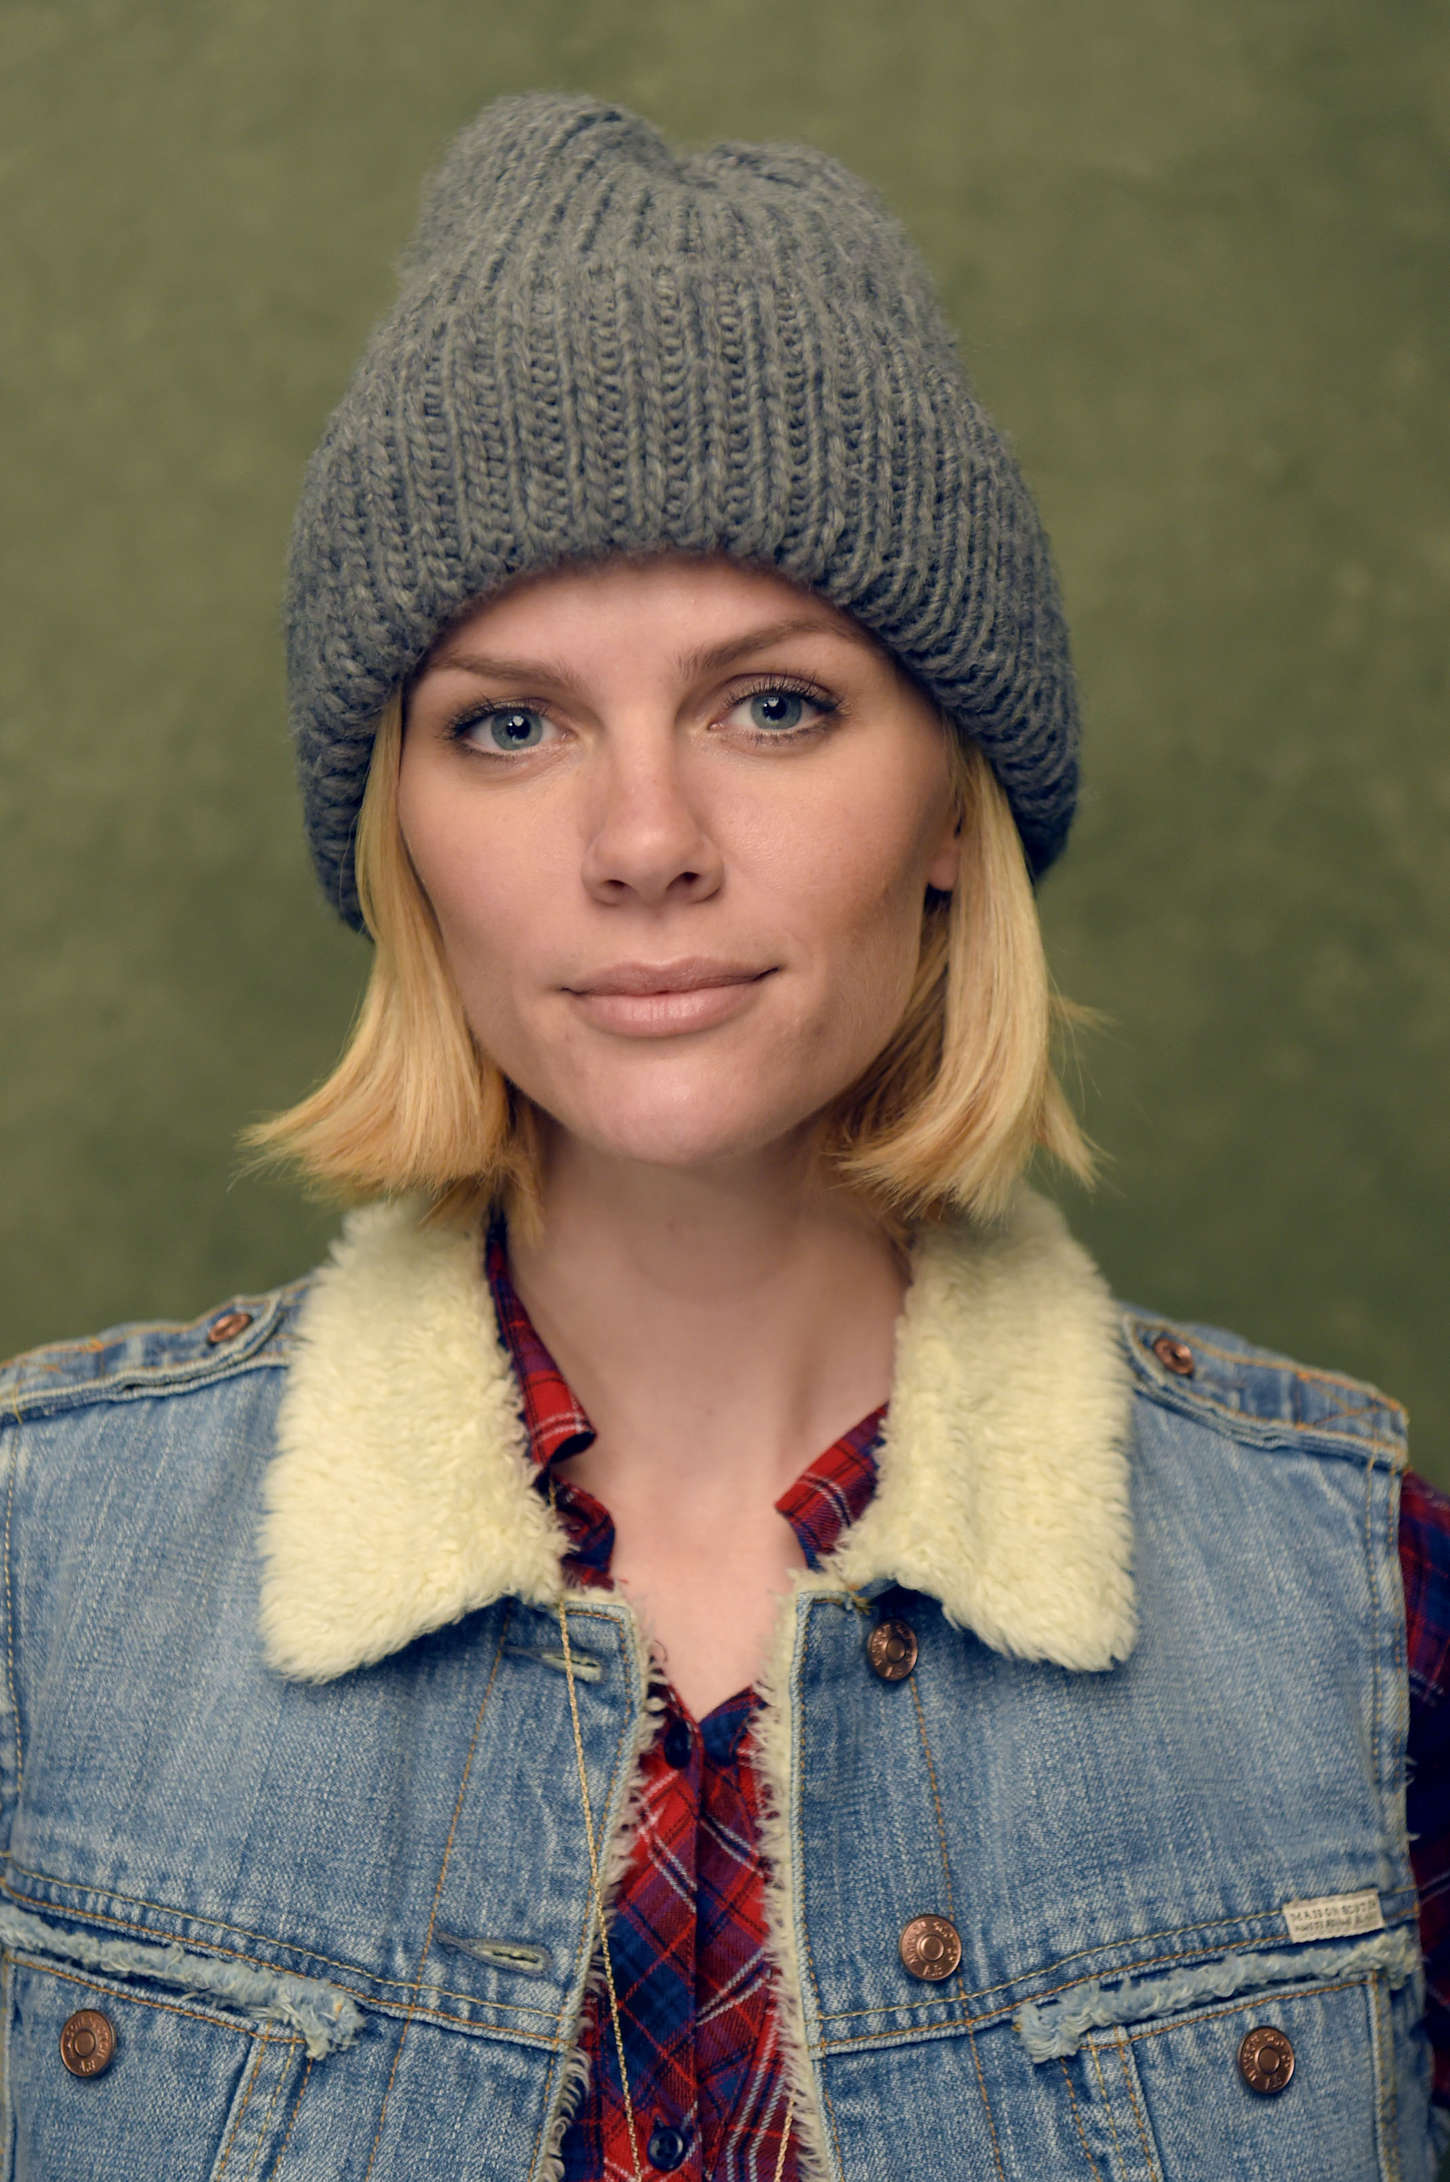 Brooklyn Decker Results Portraits Sundance Film Festival in Park City